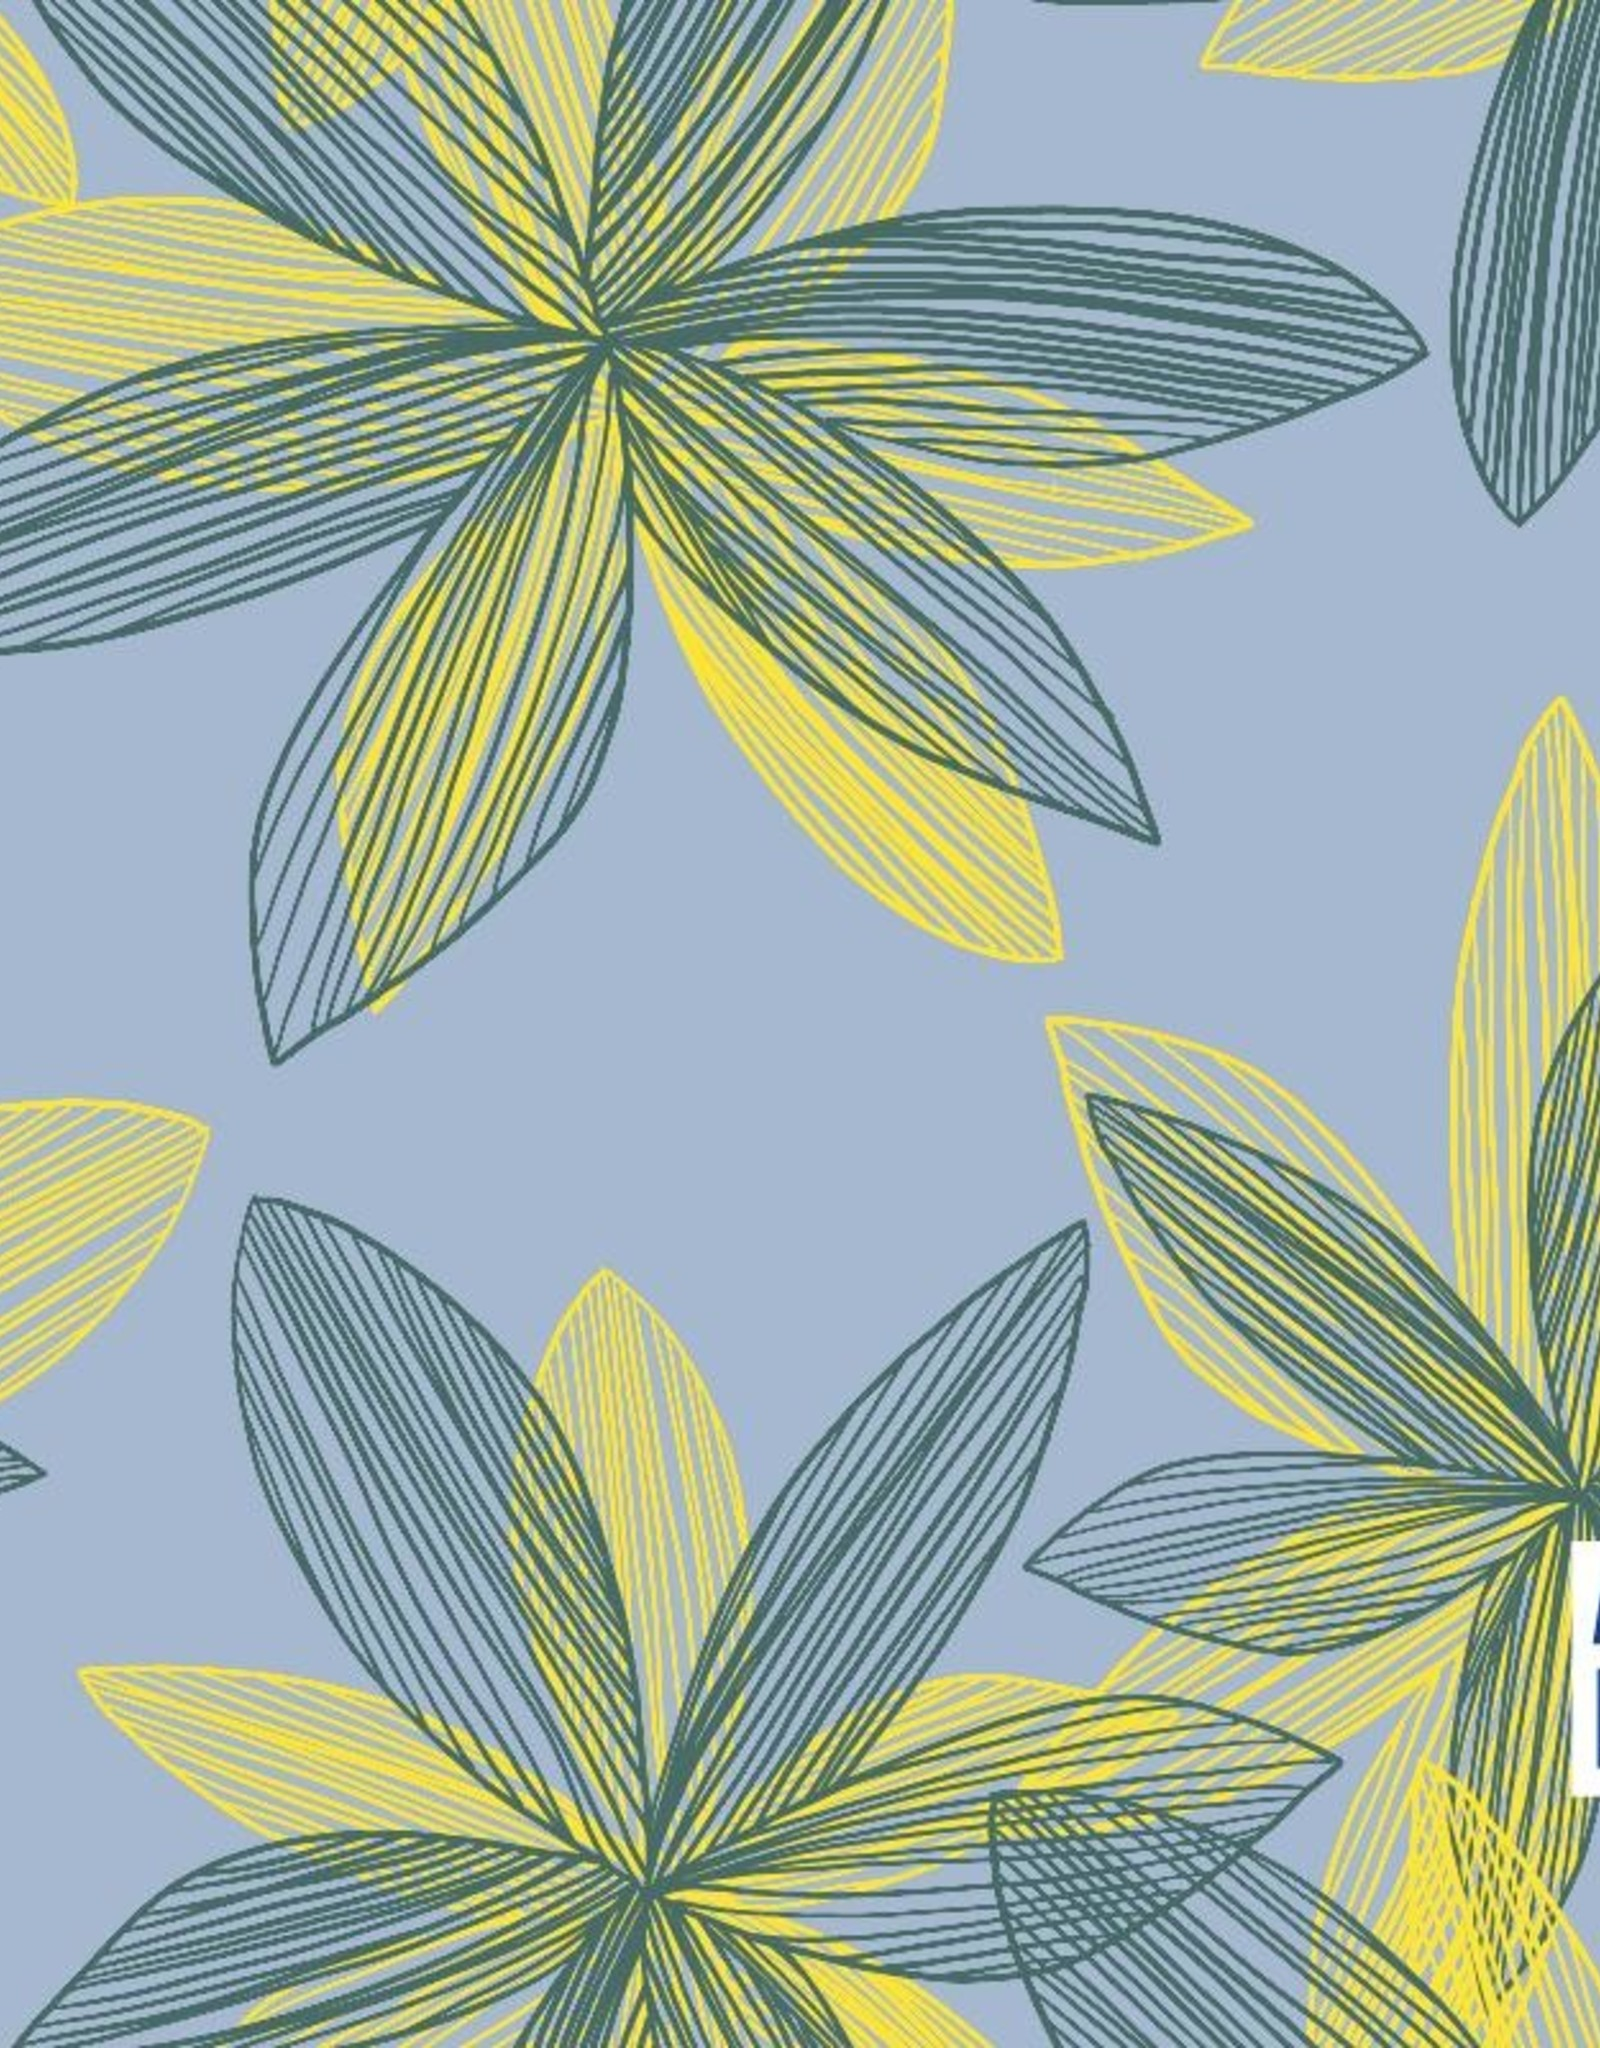 About Blue Fabrics Let me be a flower crepe viscose - About Blue